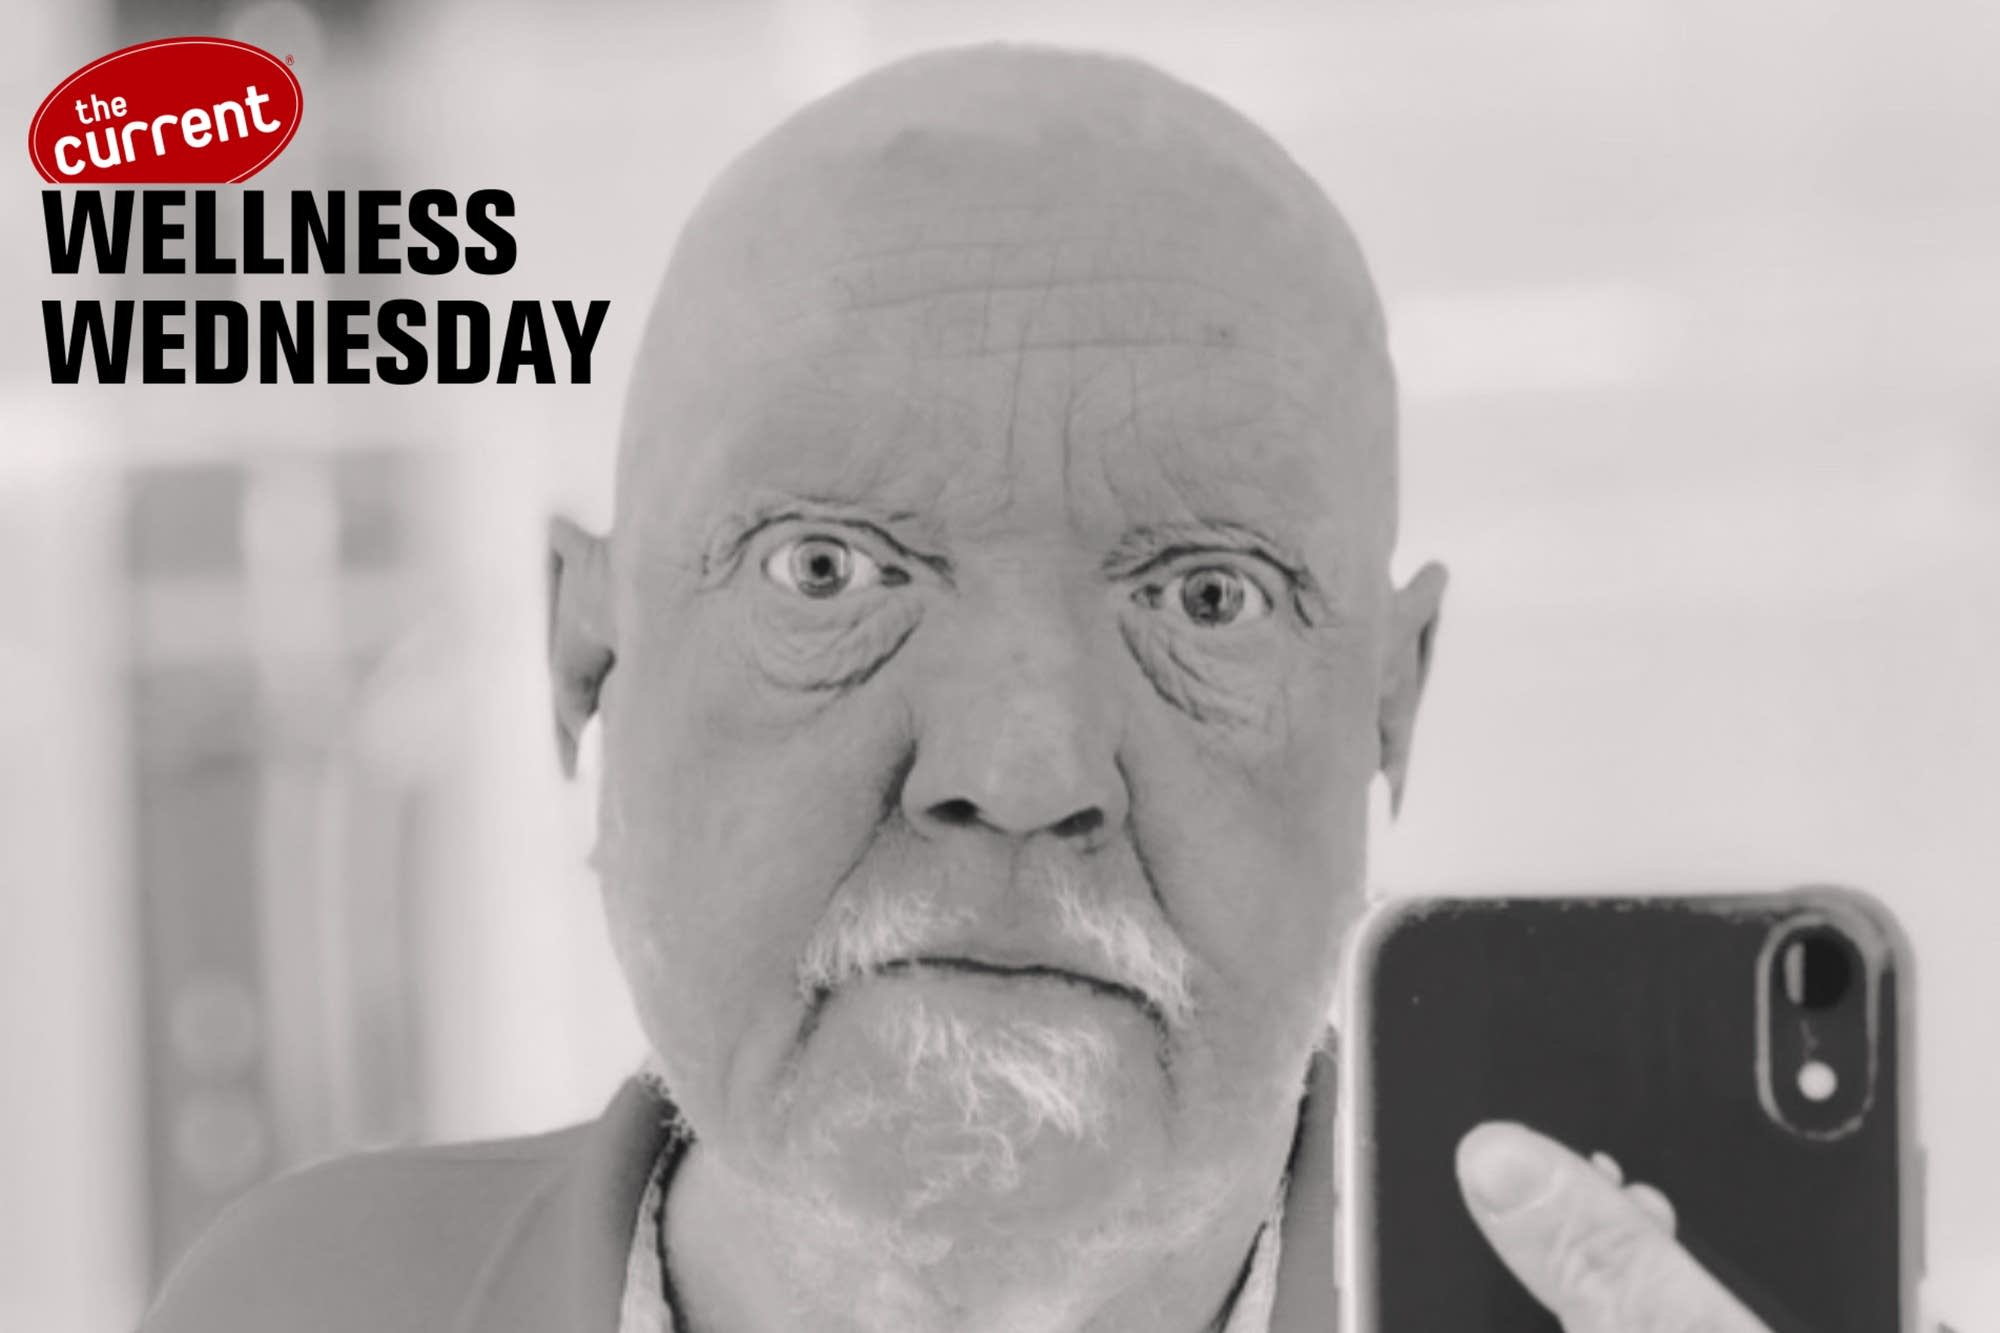 Man holding phone with Wellness Wednesday logo overlaid.